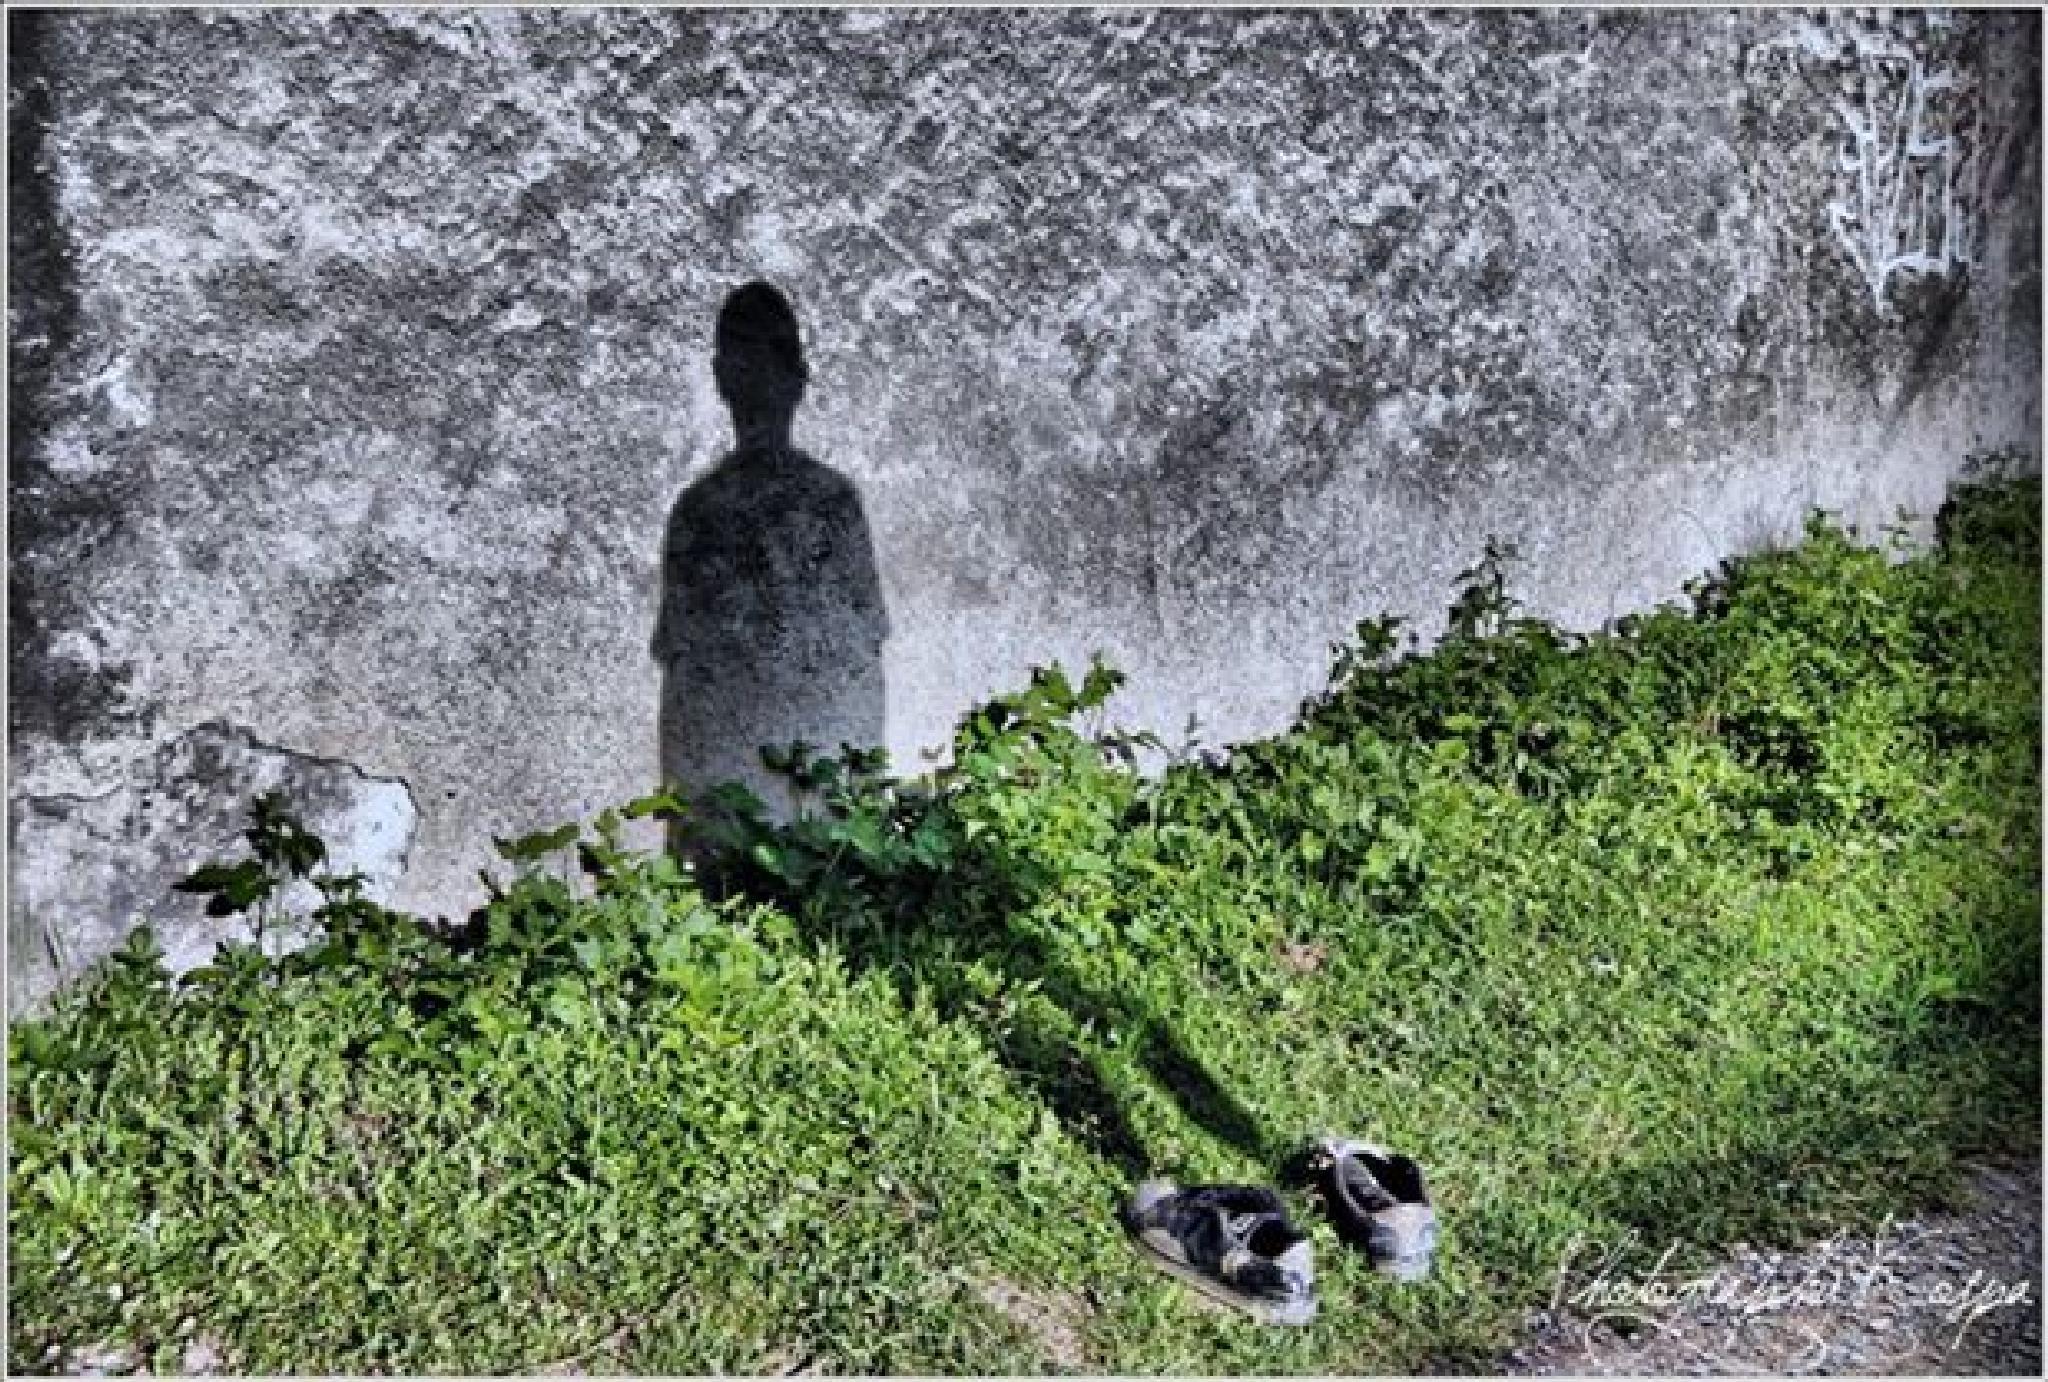 man of the shadows by kospa.kospica.3